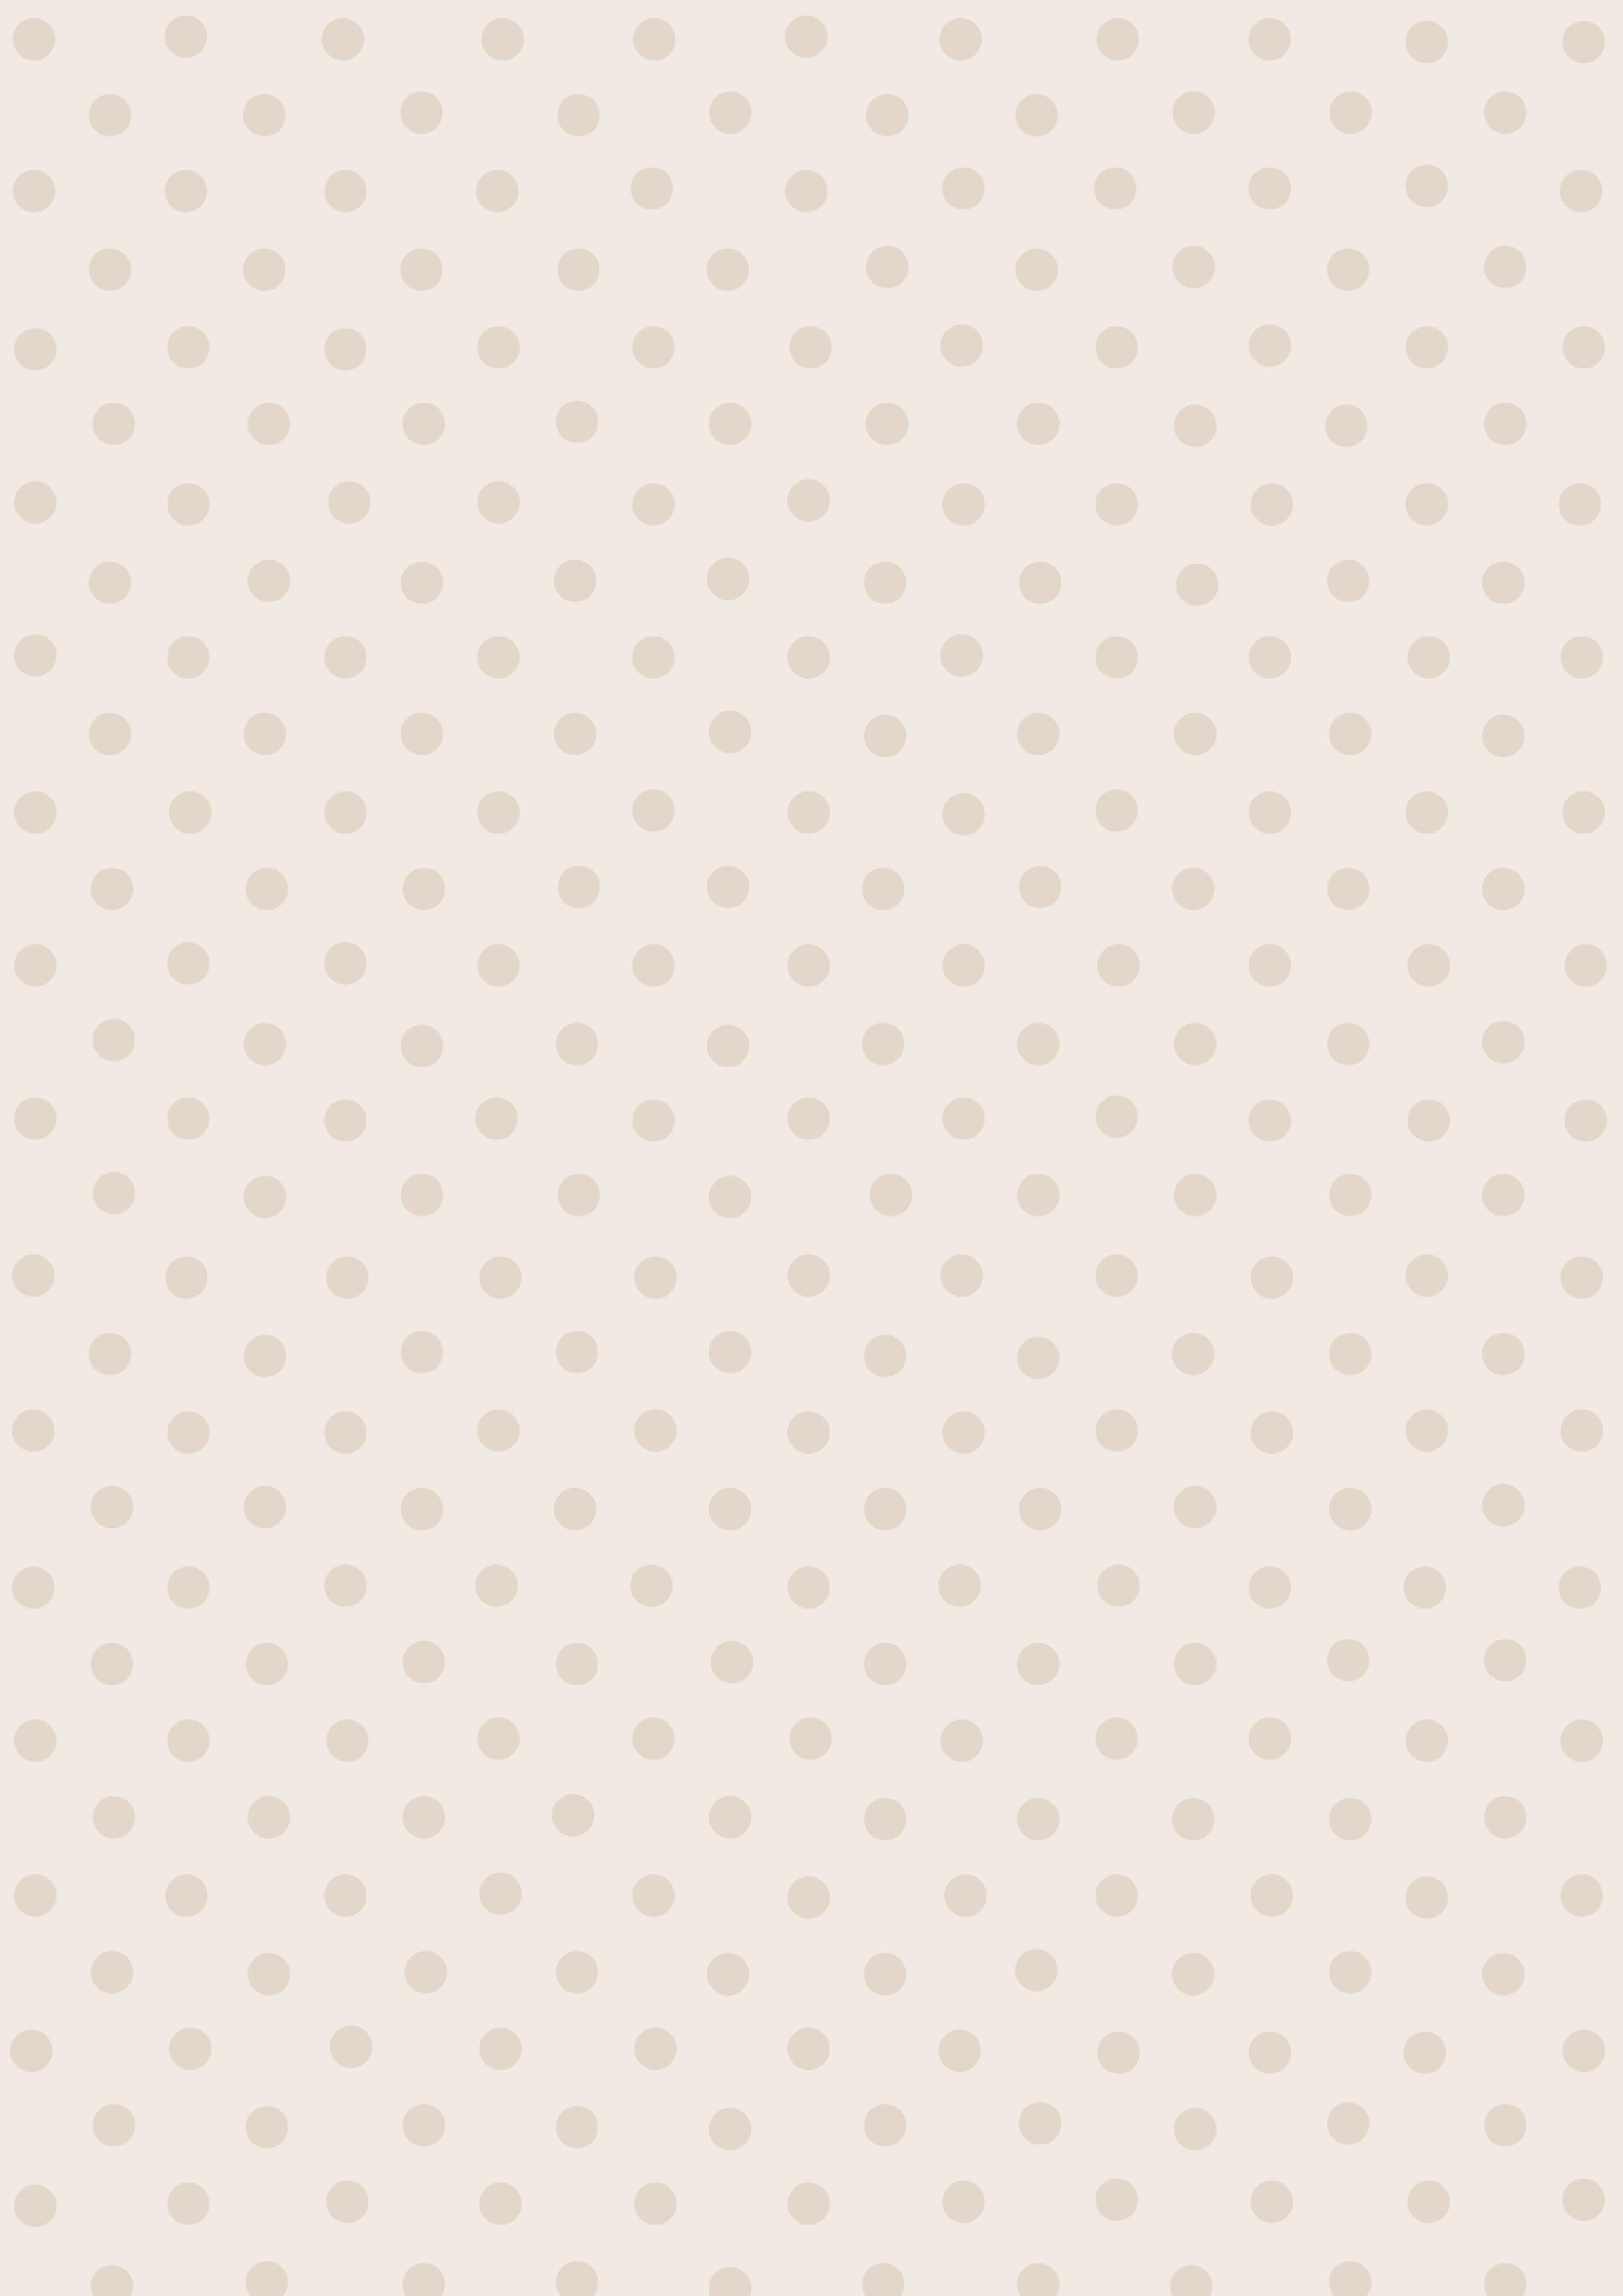 Beige Brun Clair Png 2 480 3 508 Pixel 壁紙 花 壁紙 柄 ロック画面の背景